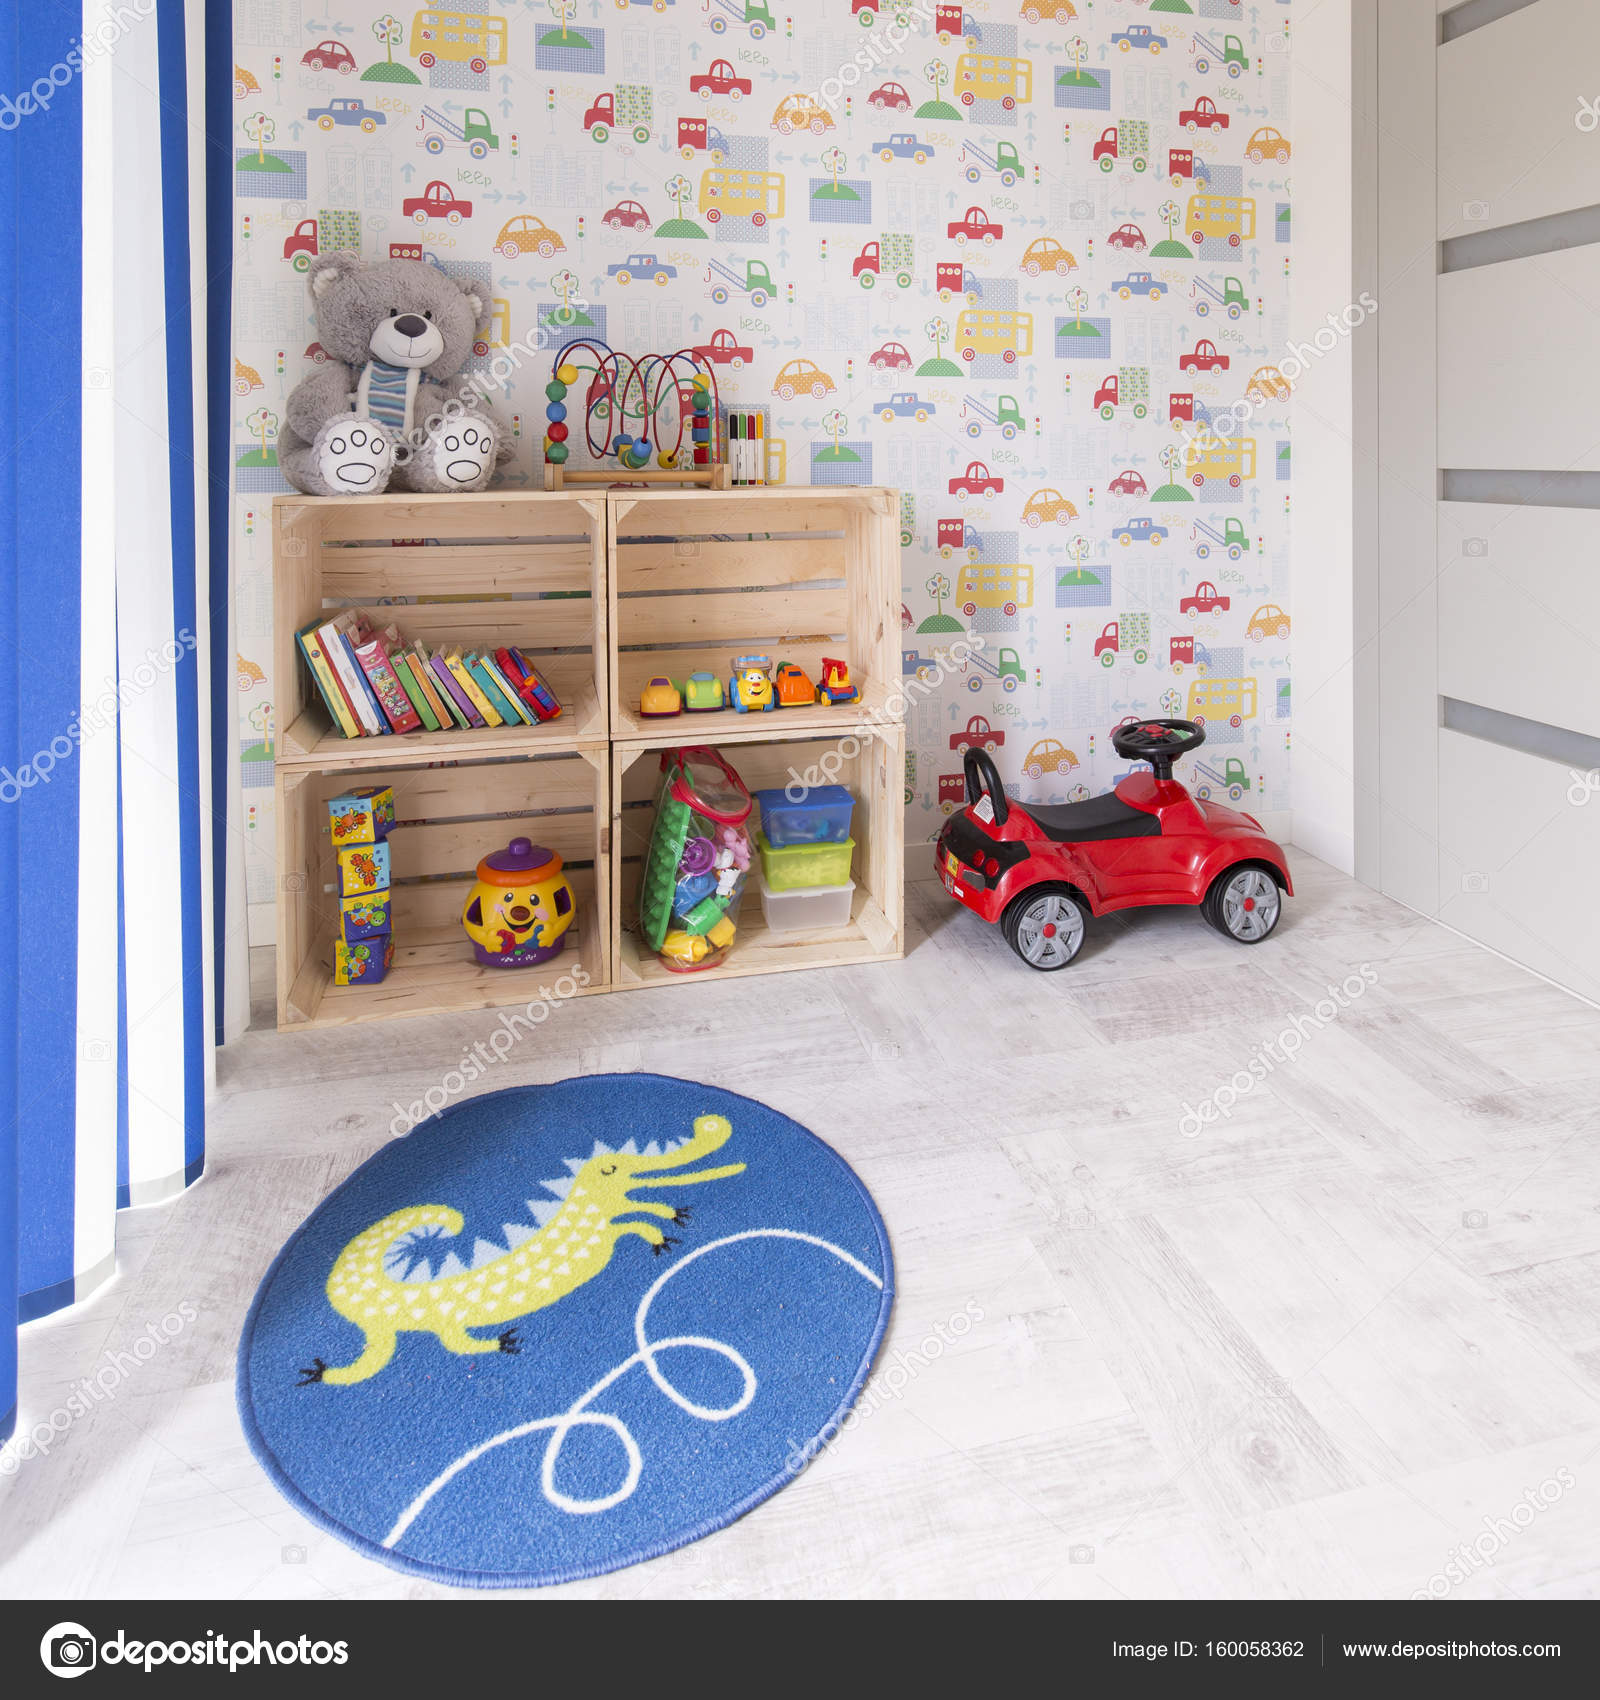 Kinderkamer met auto behang stockfoto for Behang kinderkamer